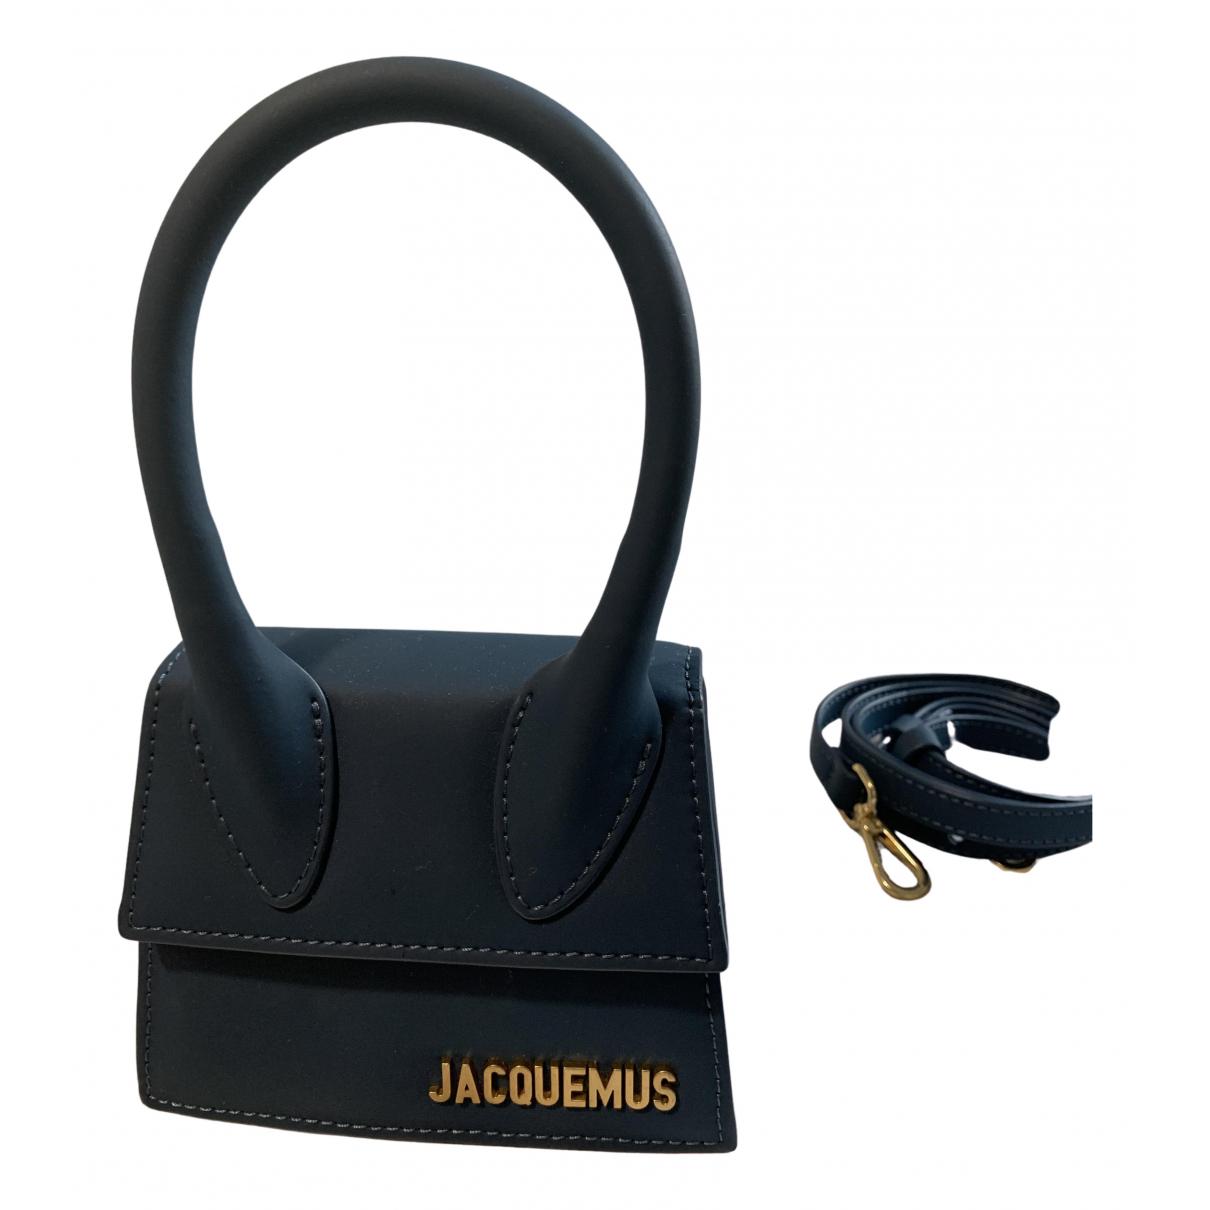 Jacquemus Chiquito Handtasche in  Marine Leder